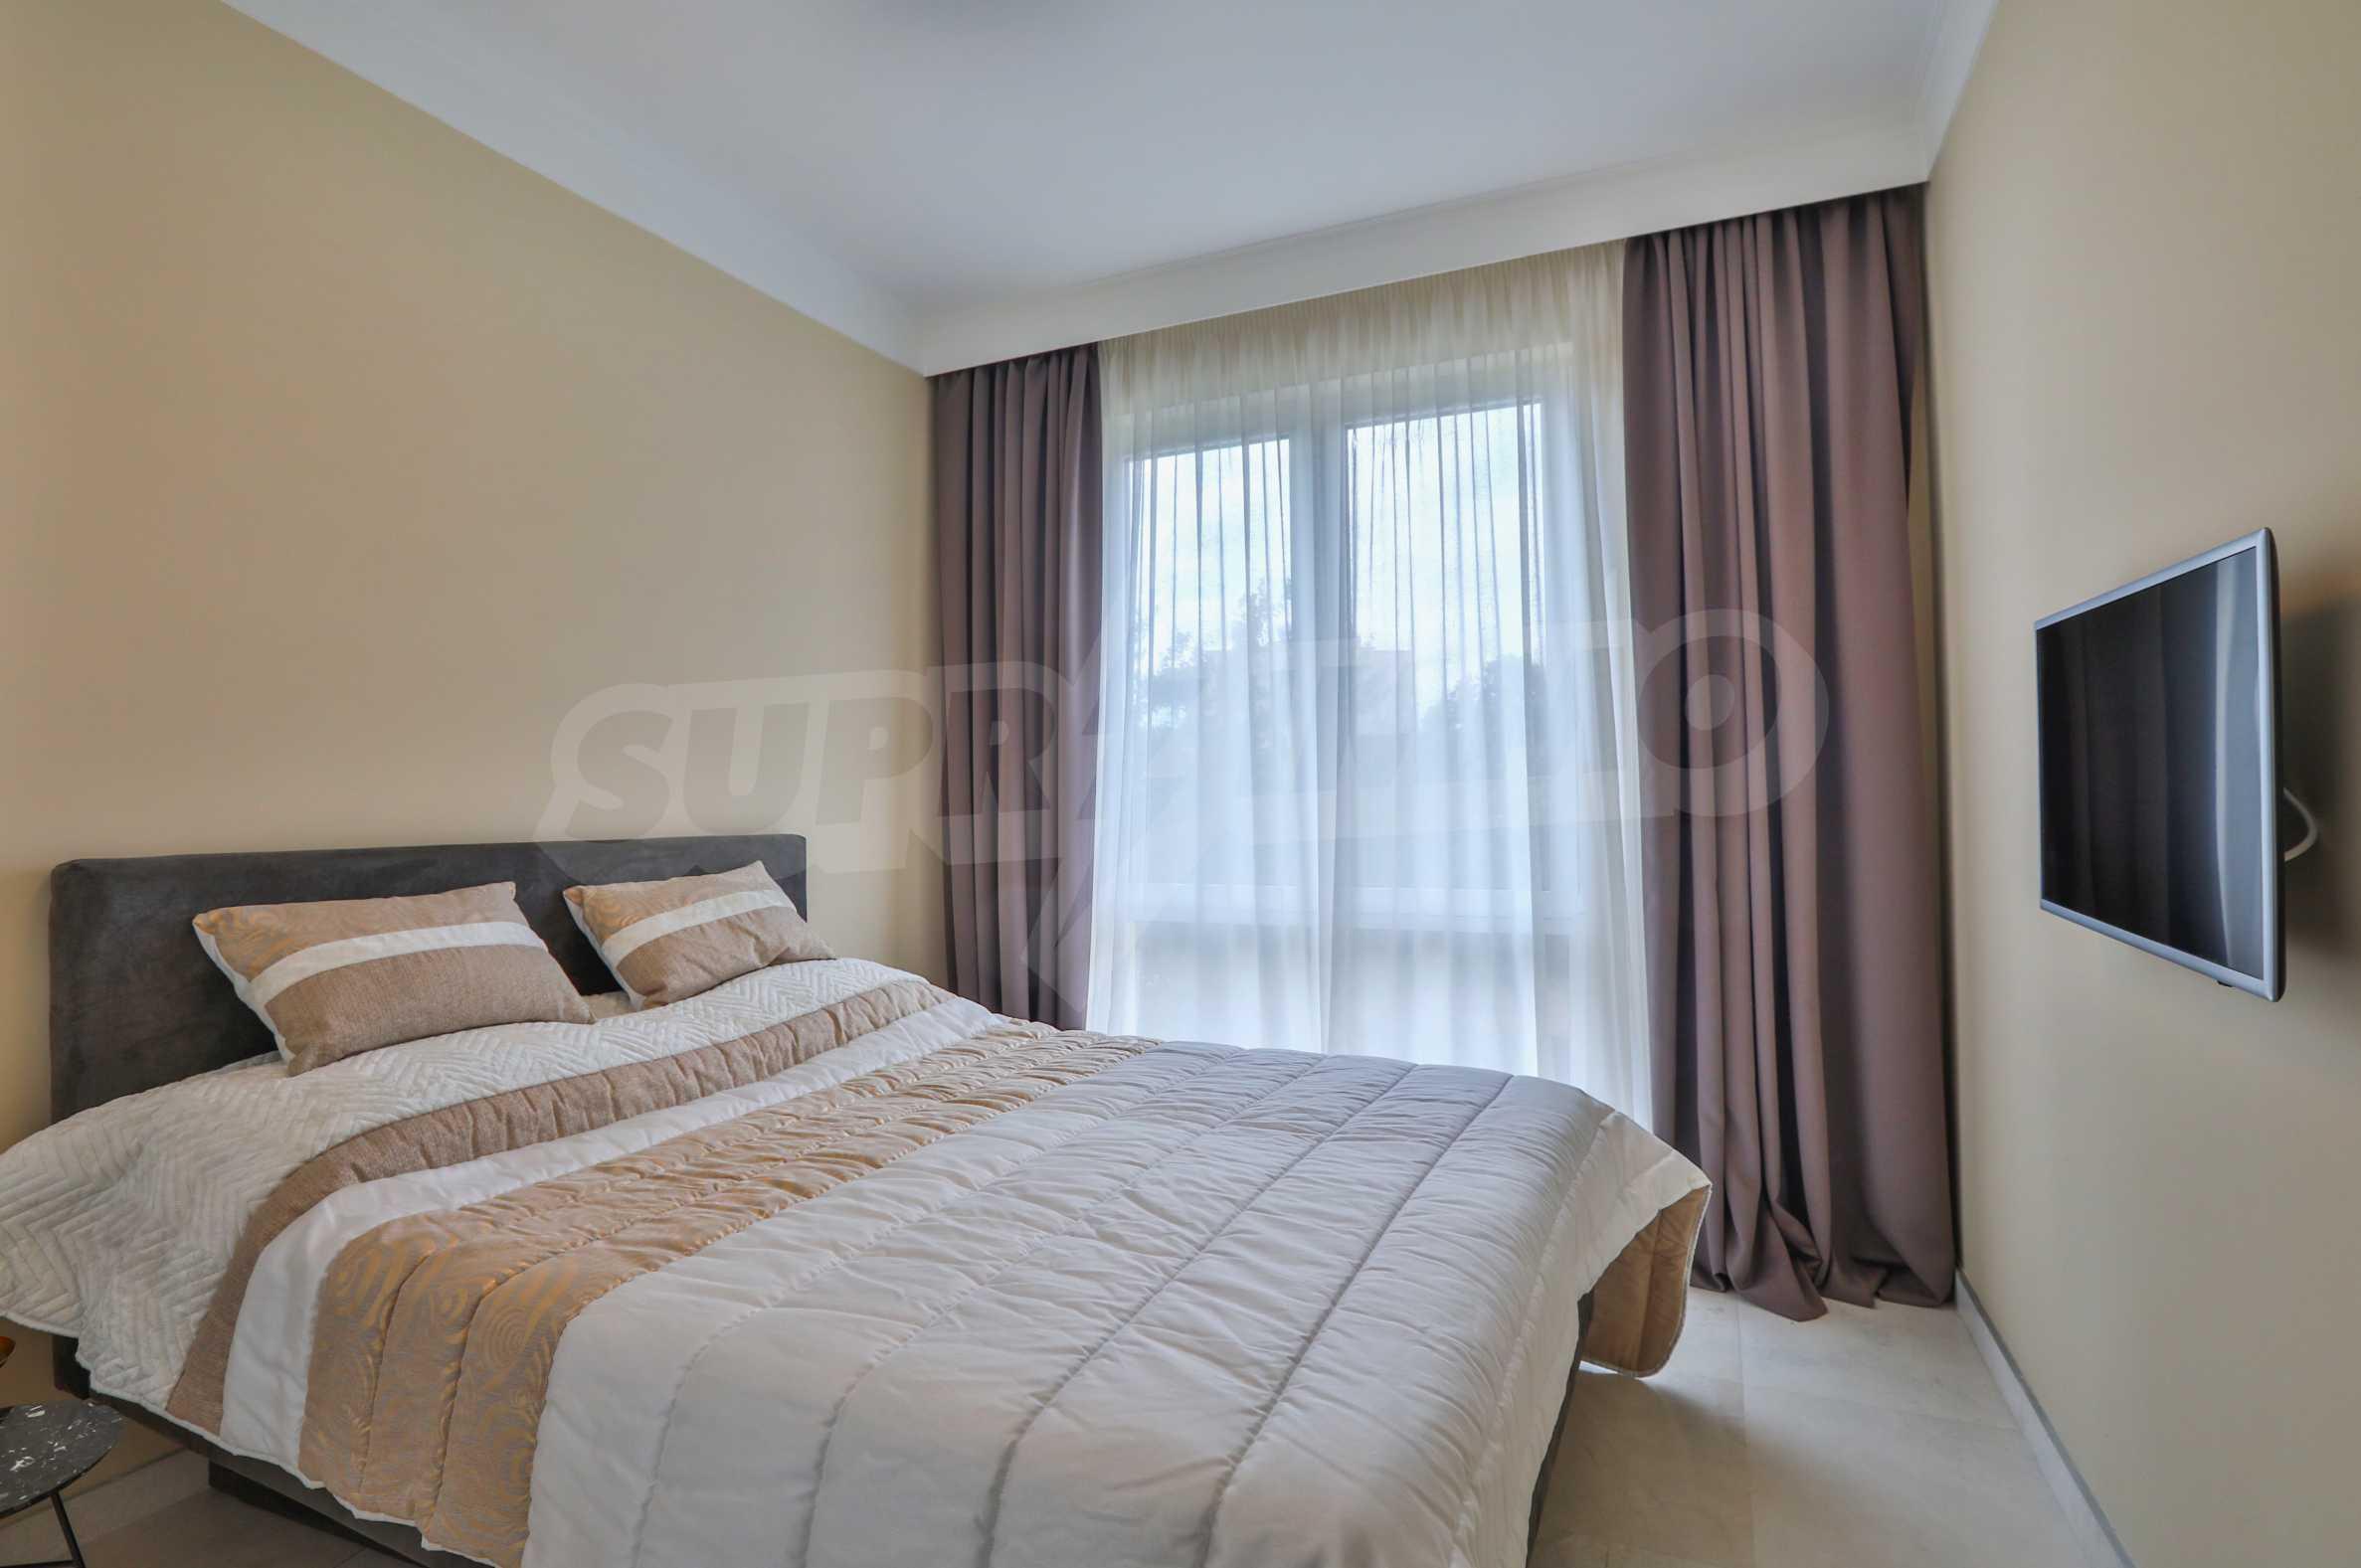 Exclusive 2-bedroom beachfront apartment in the prestigious Belle Époque Beach Residence 19